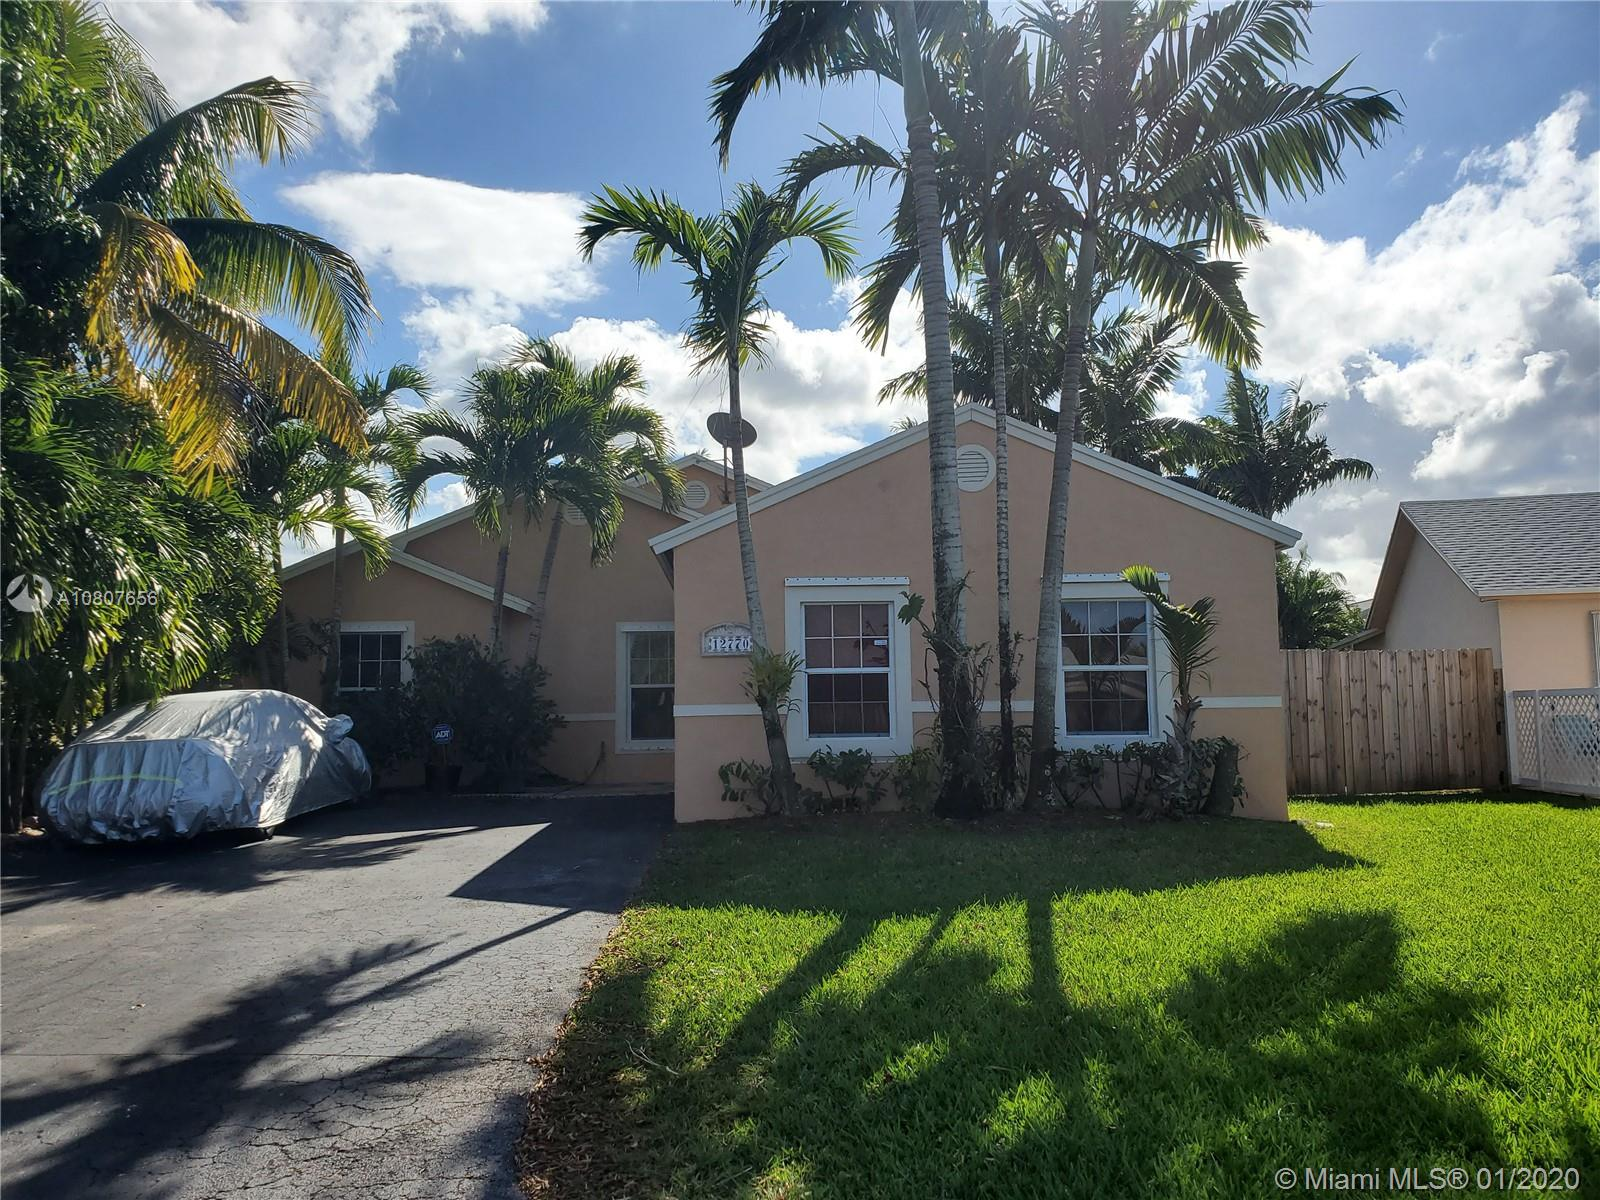 12770 SW 249th Ter, Homestead, FL 33032 - Homestead, FL real estate listing